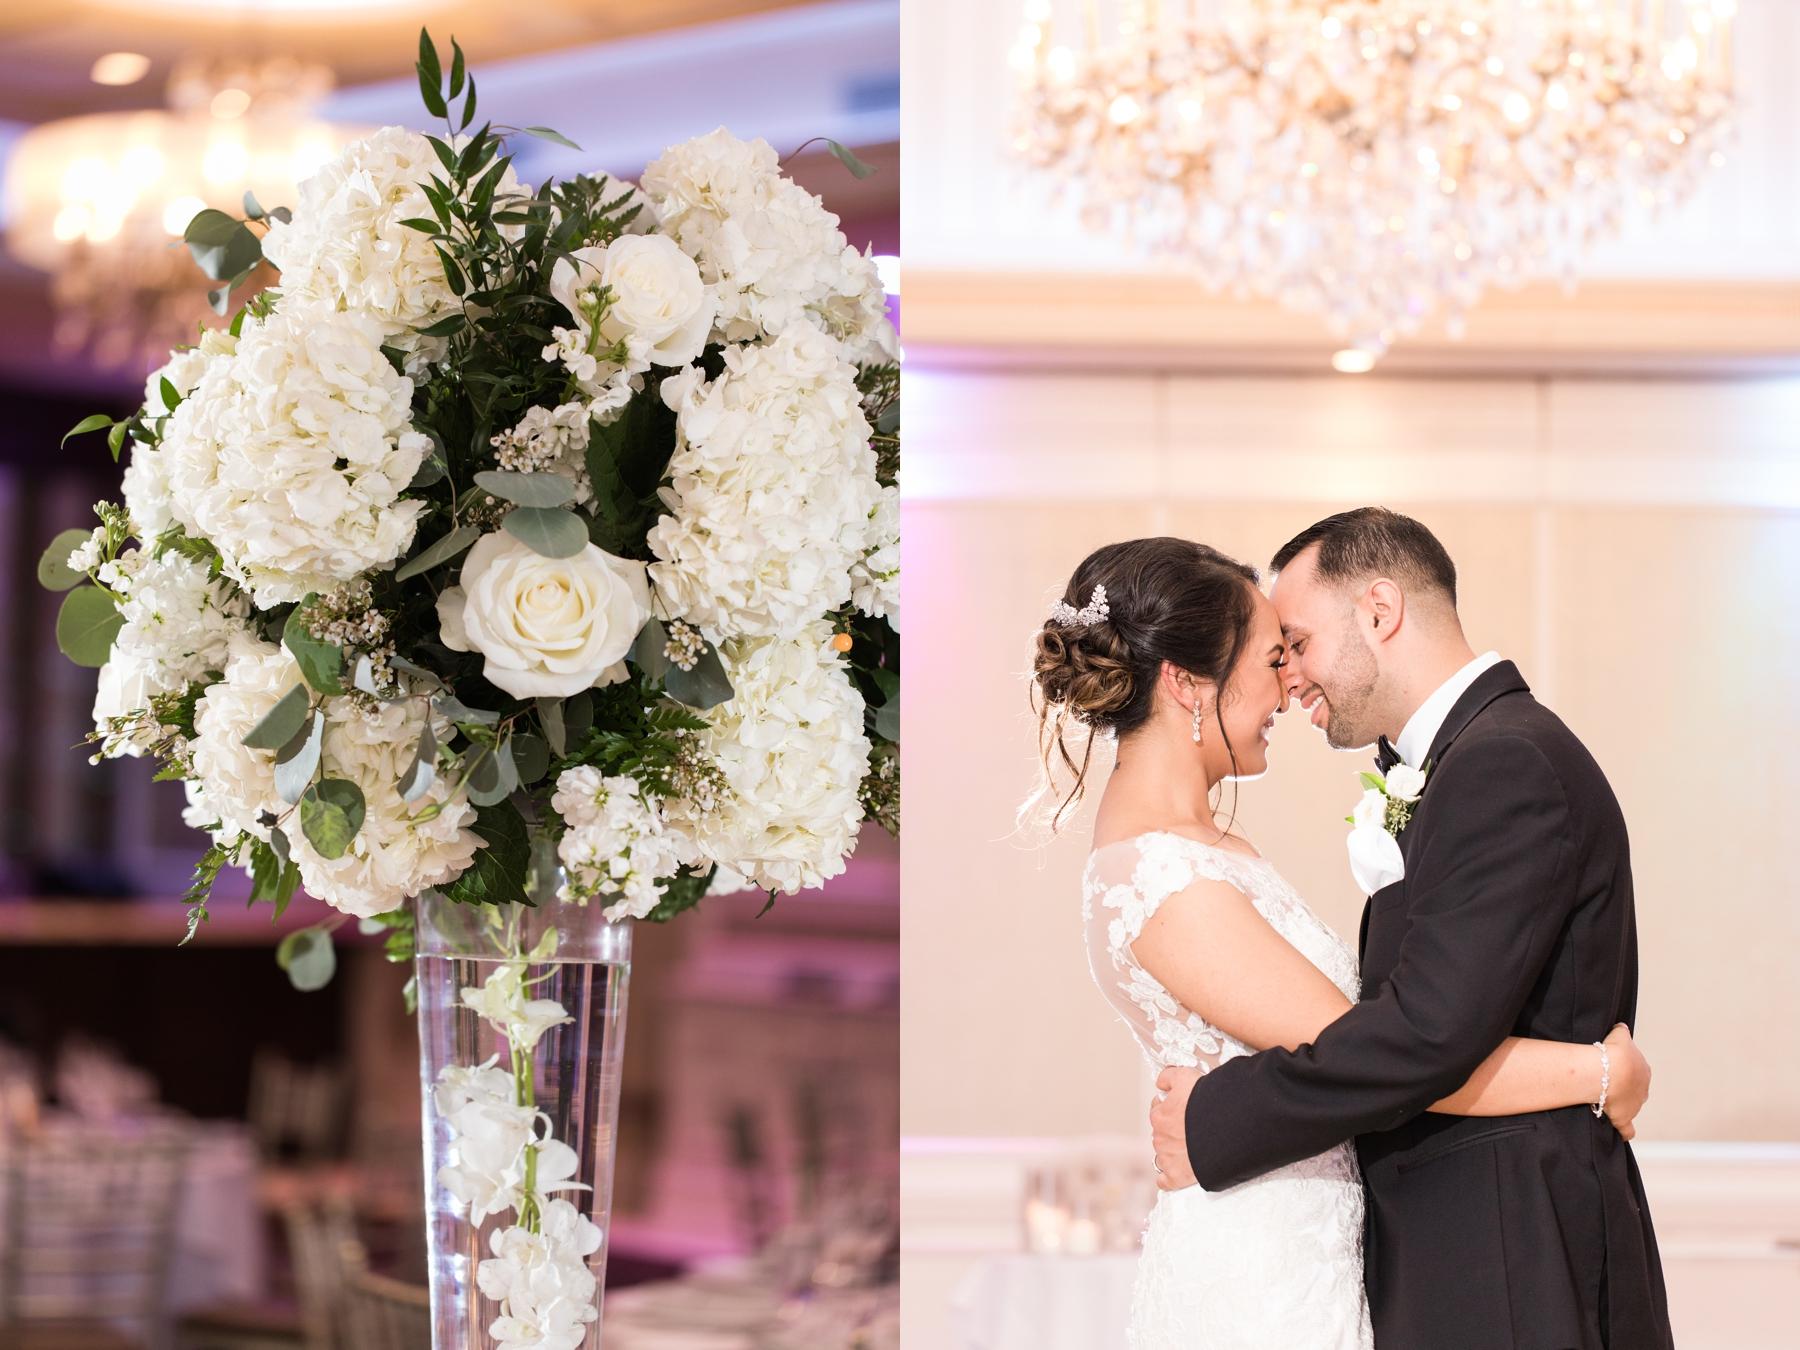 Joyce and Chris's Wedding At The Terrace in Paramus, NJ